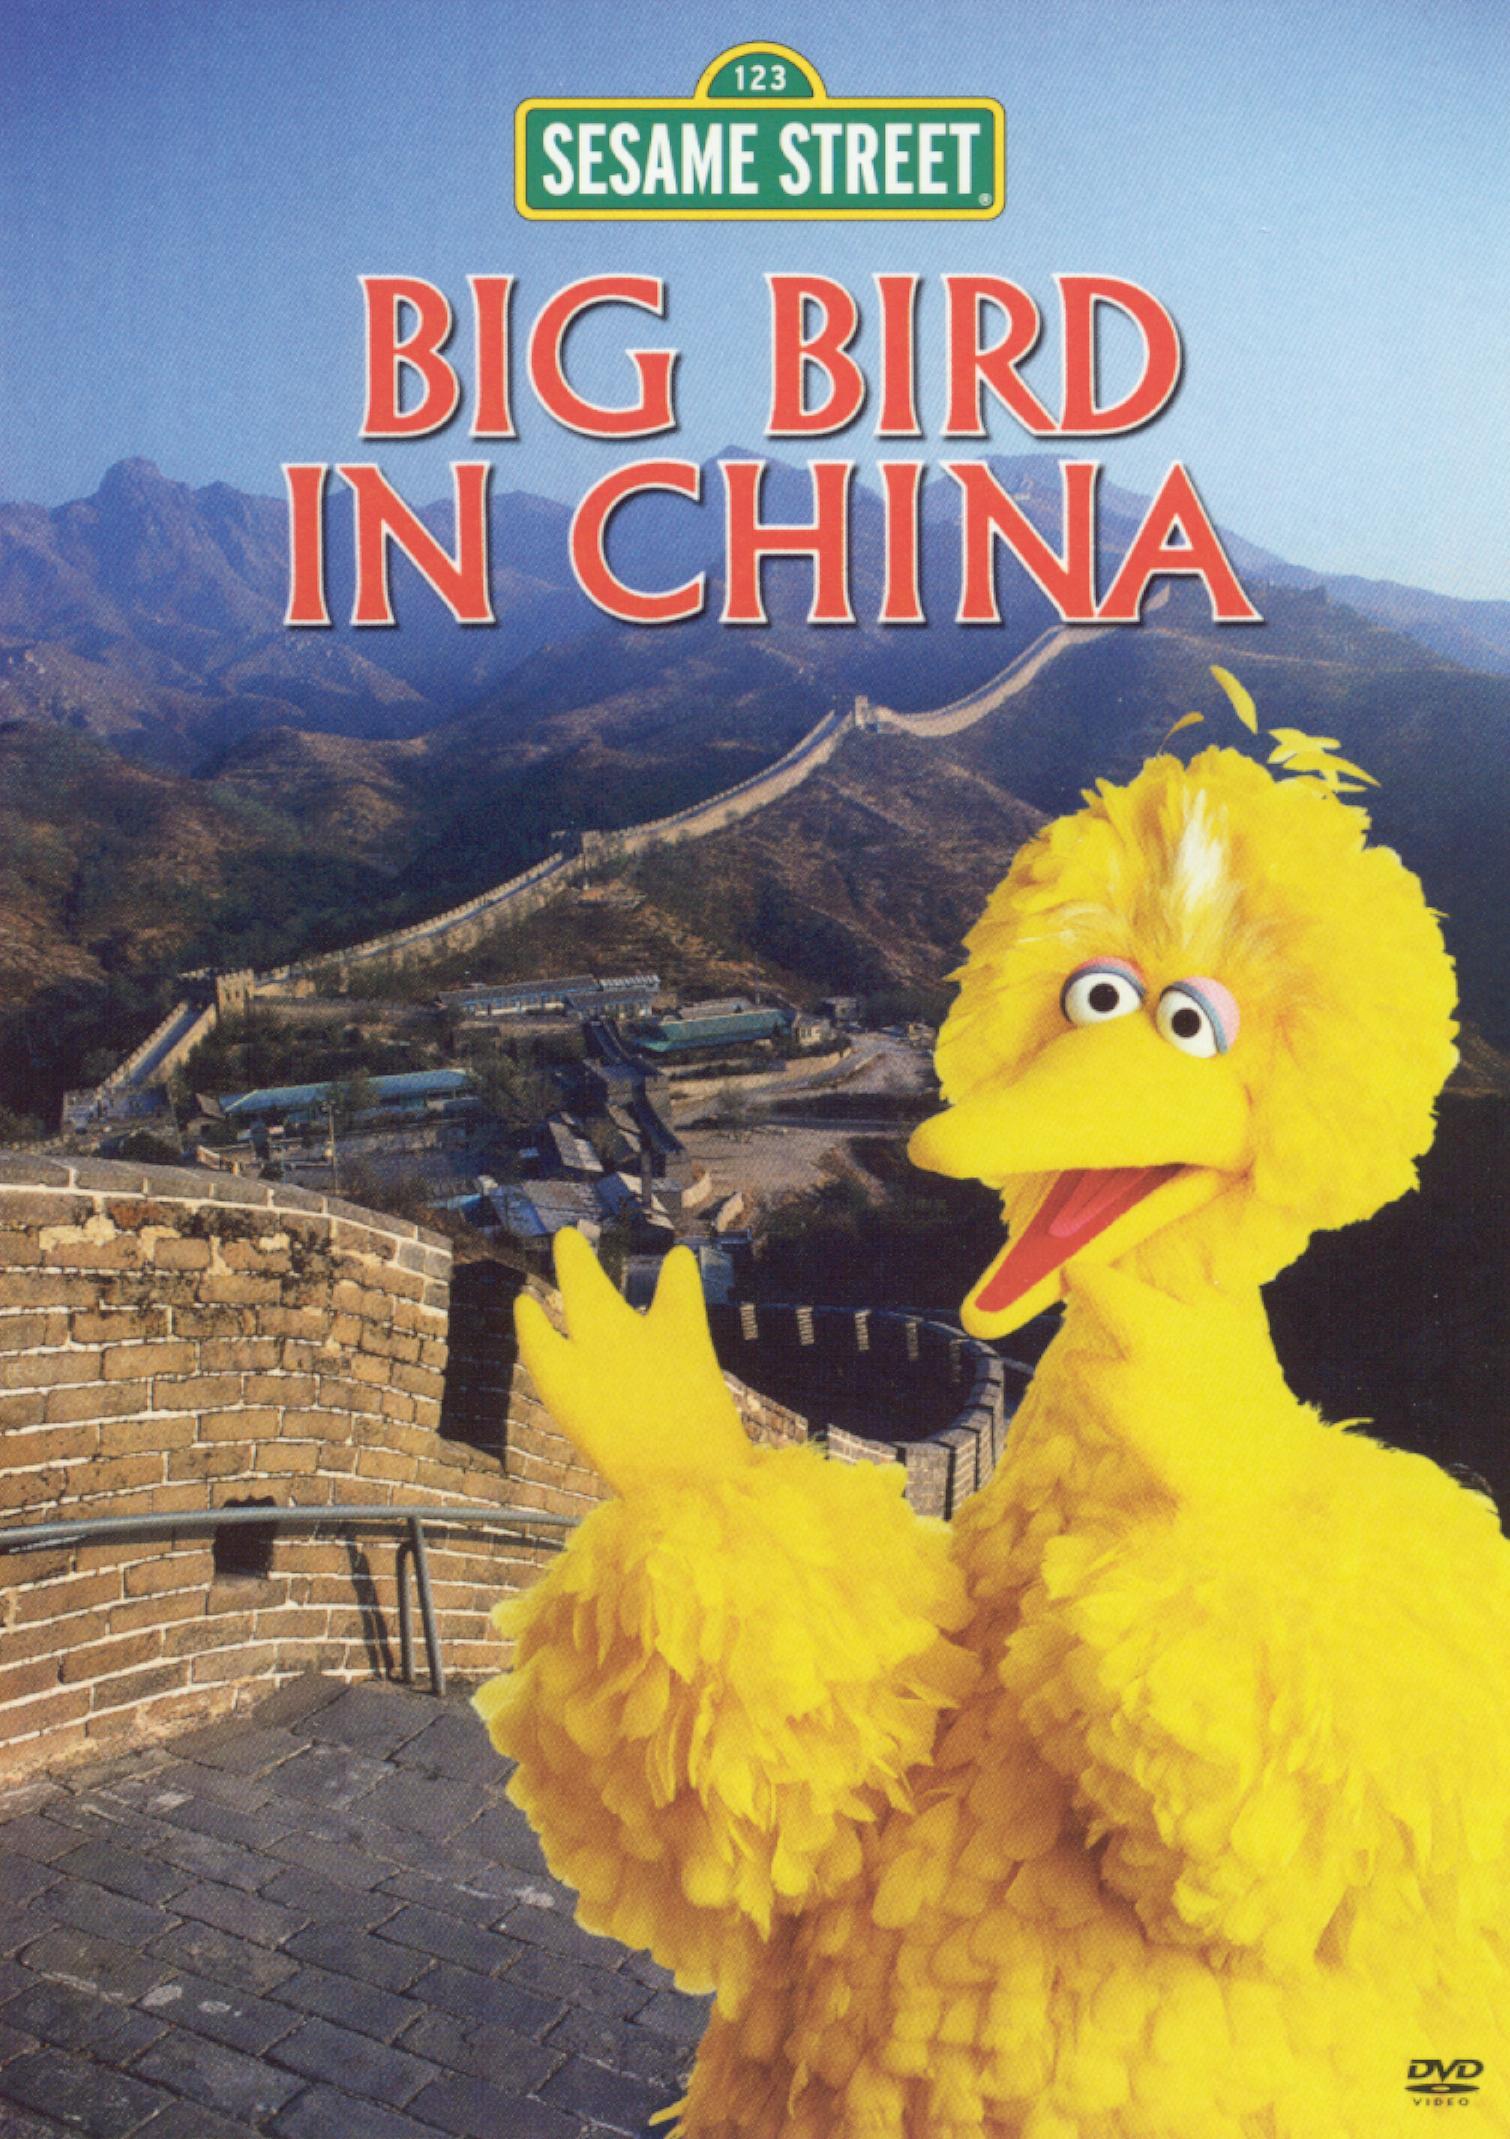 Sesame Street: Big Bird in China